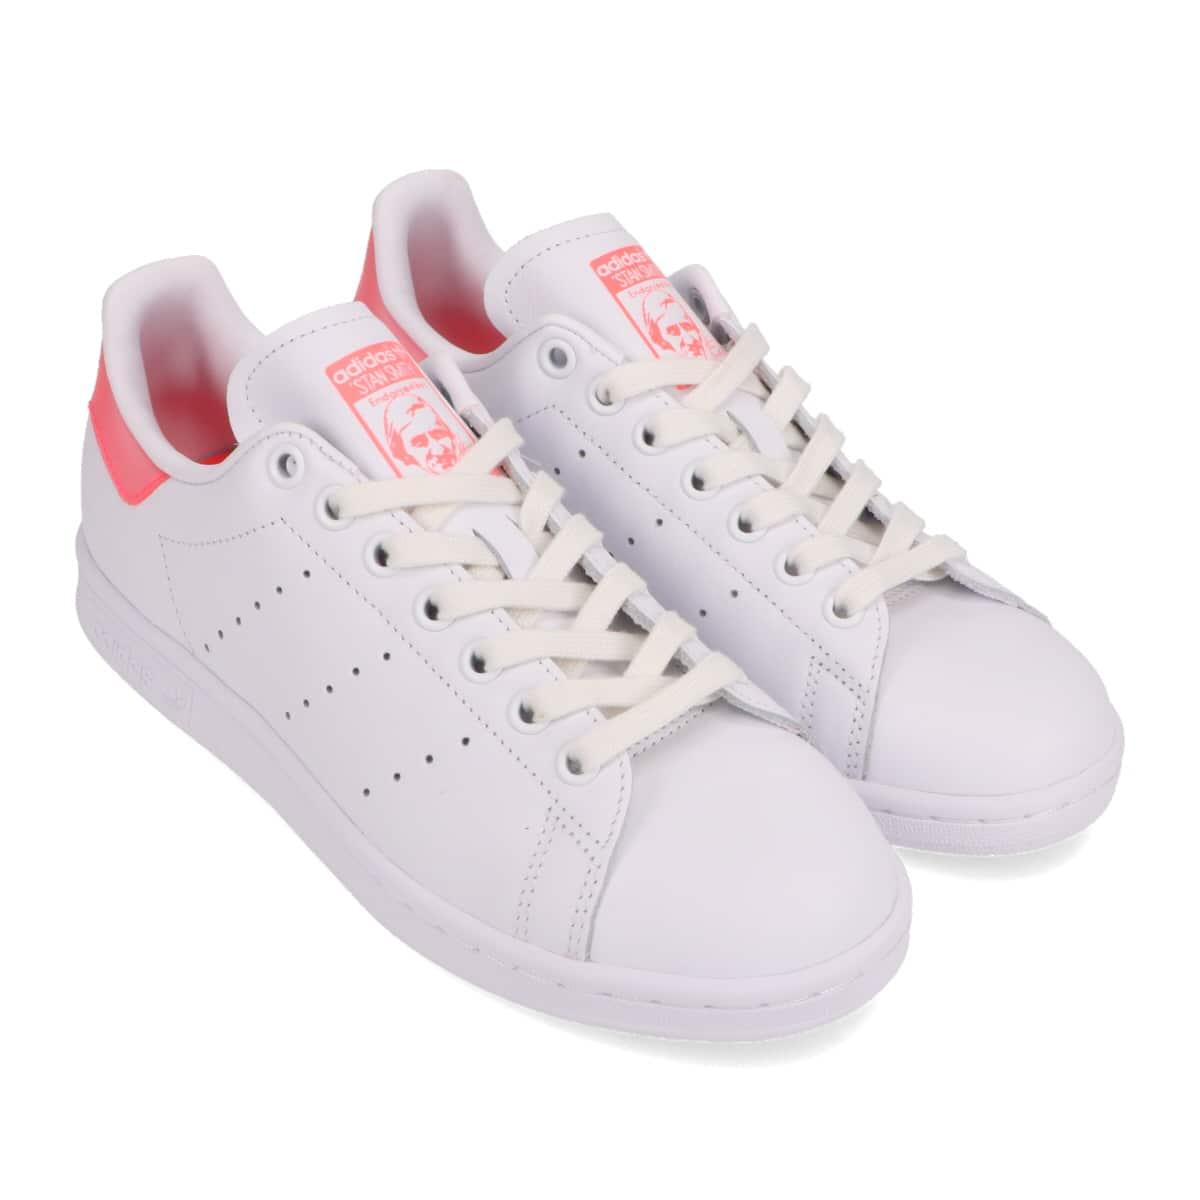 adidas STAN SMITH W FOOTWEAR WHITE/SIGNAL PINK/FOOTWEAR WHITE 20FW-I_photo_large